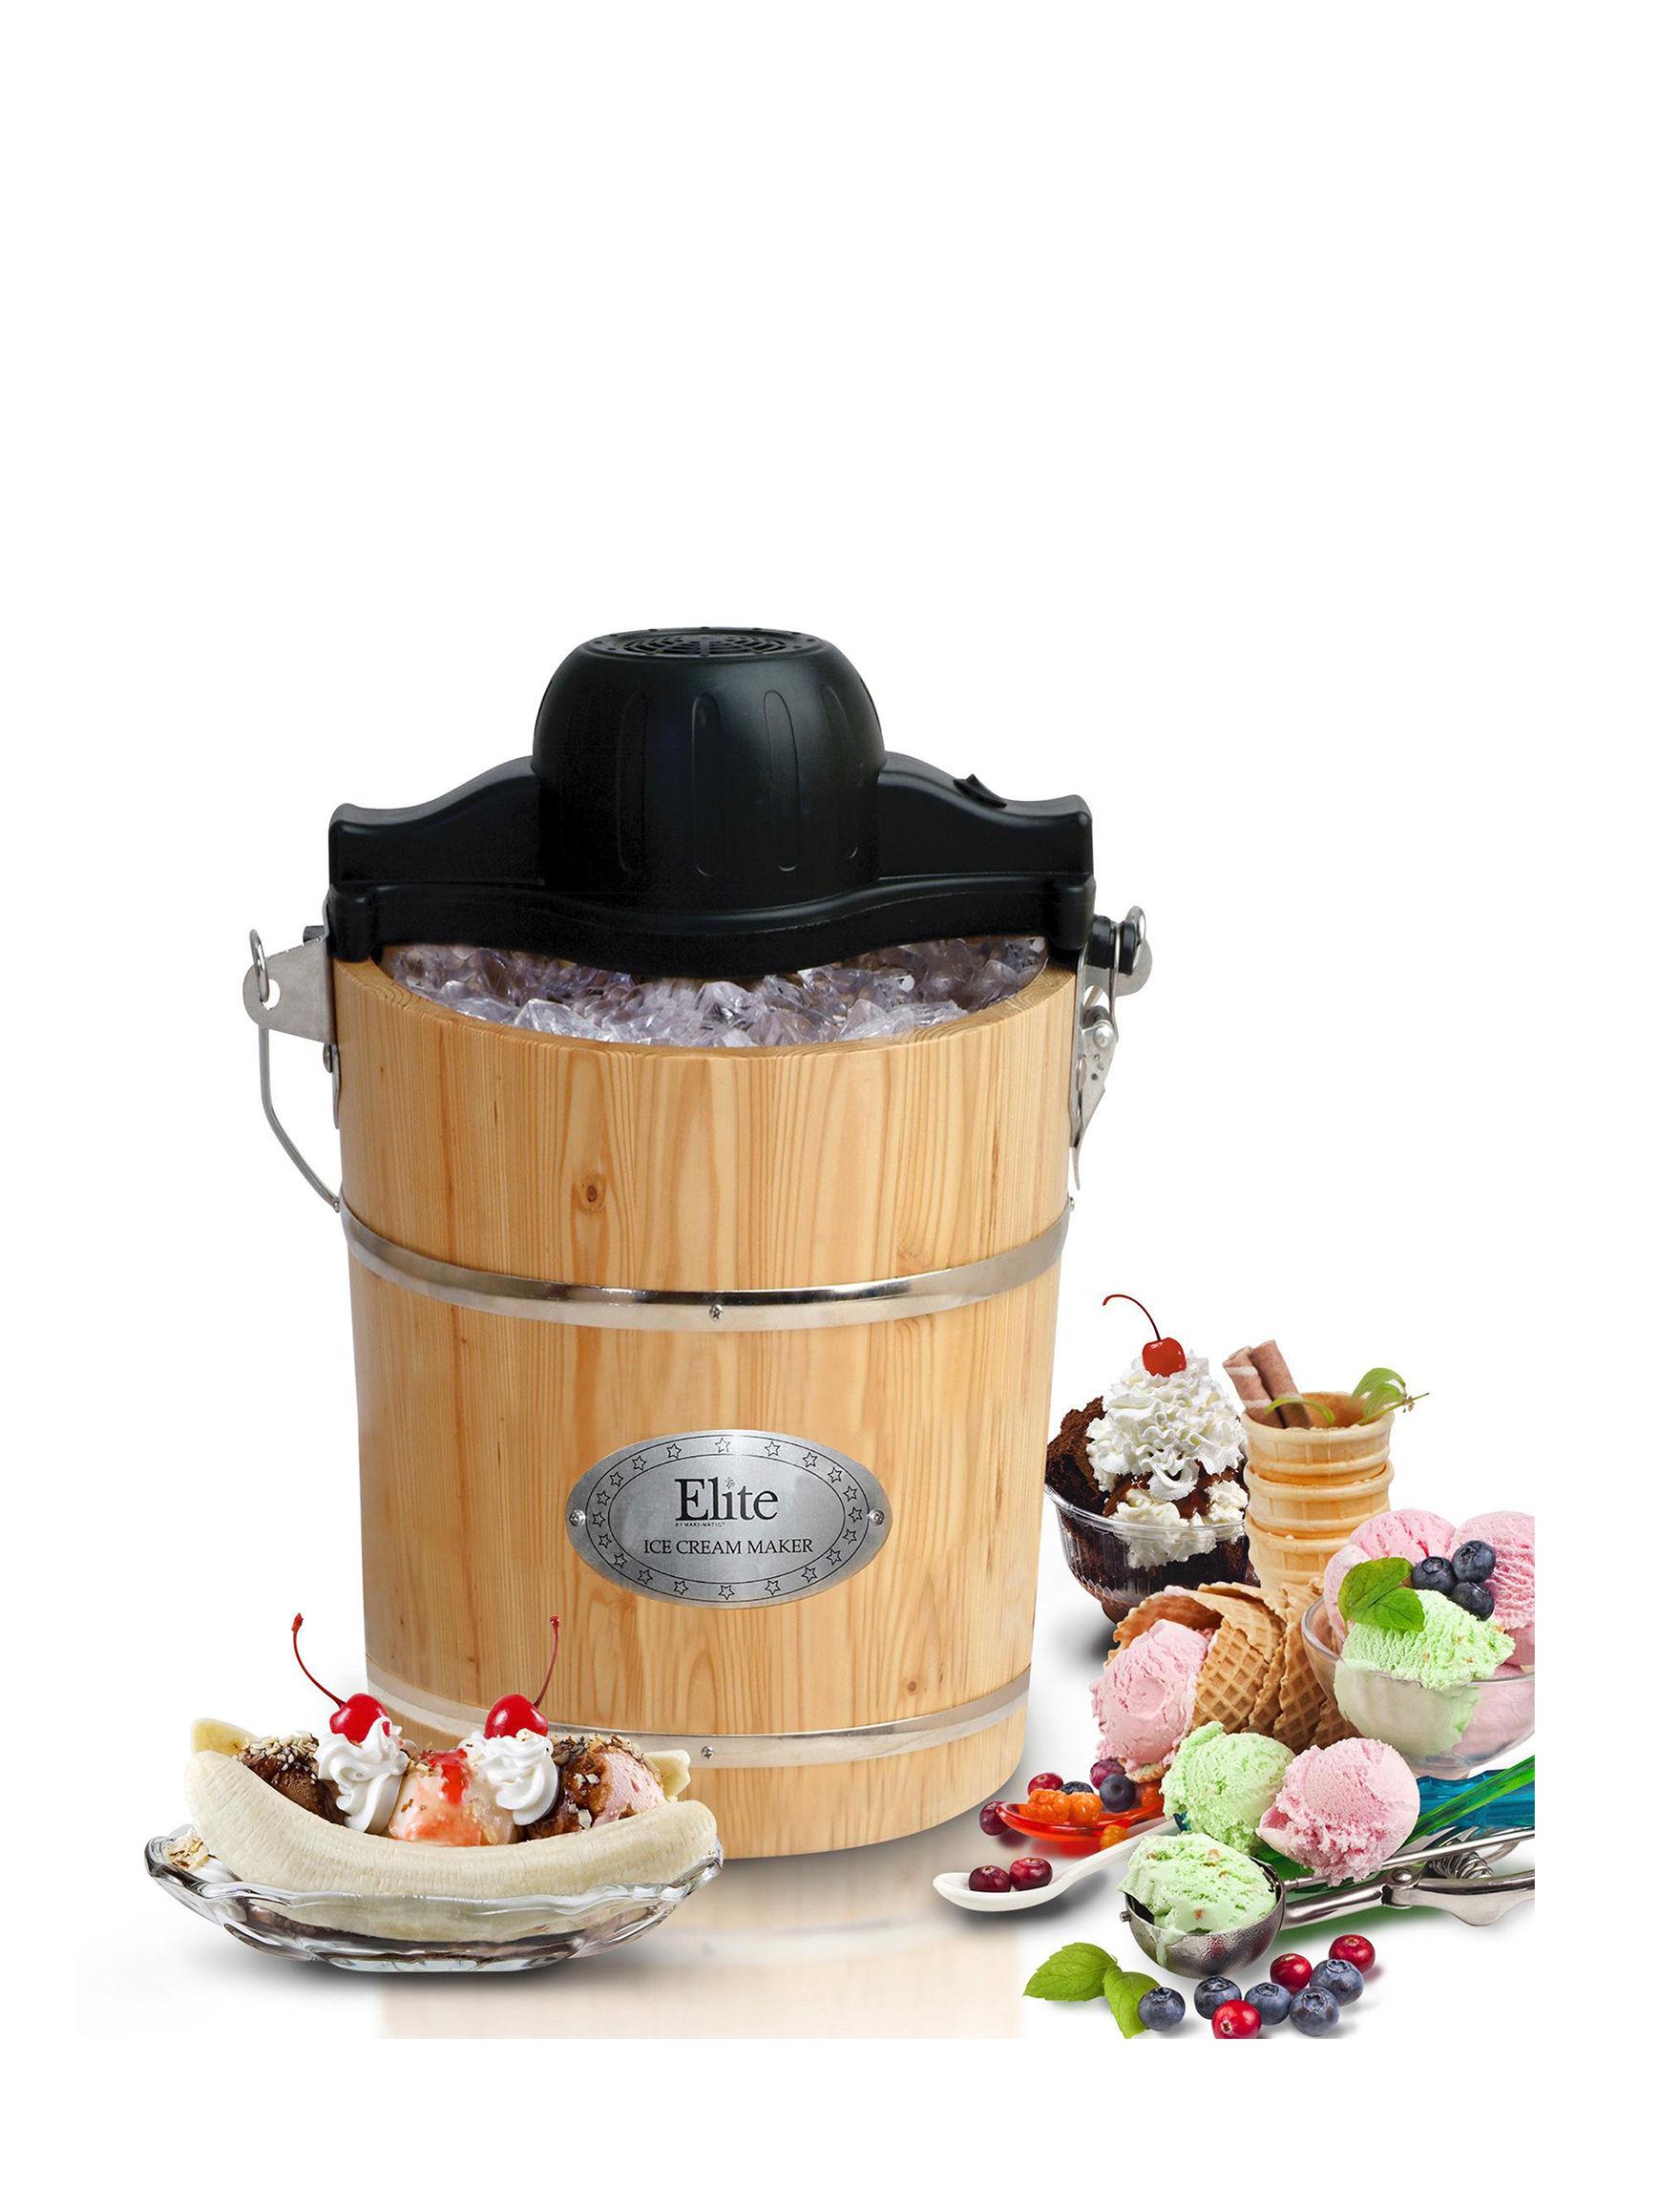 Elite Gourmet Brown Specialty Food Makers Kitchen Appliances